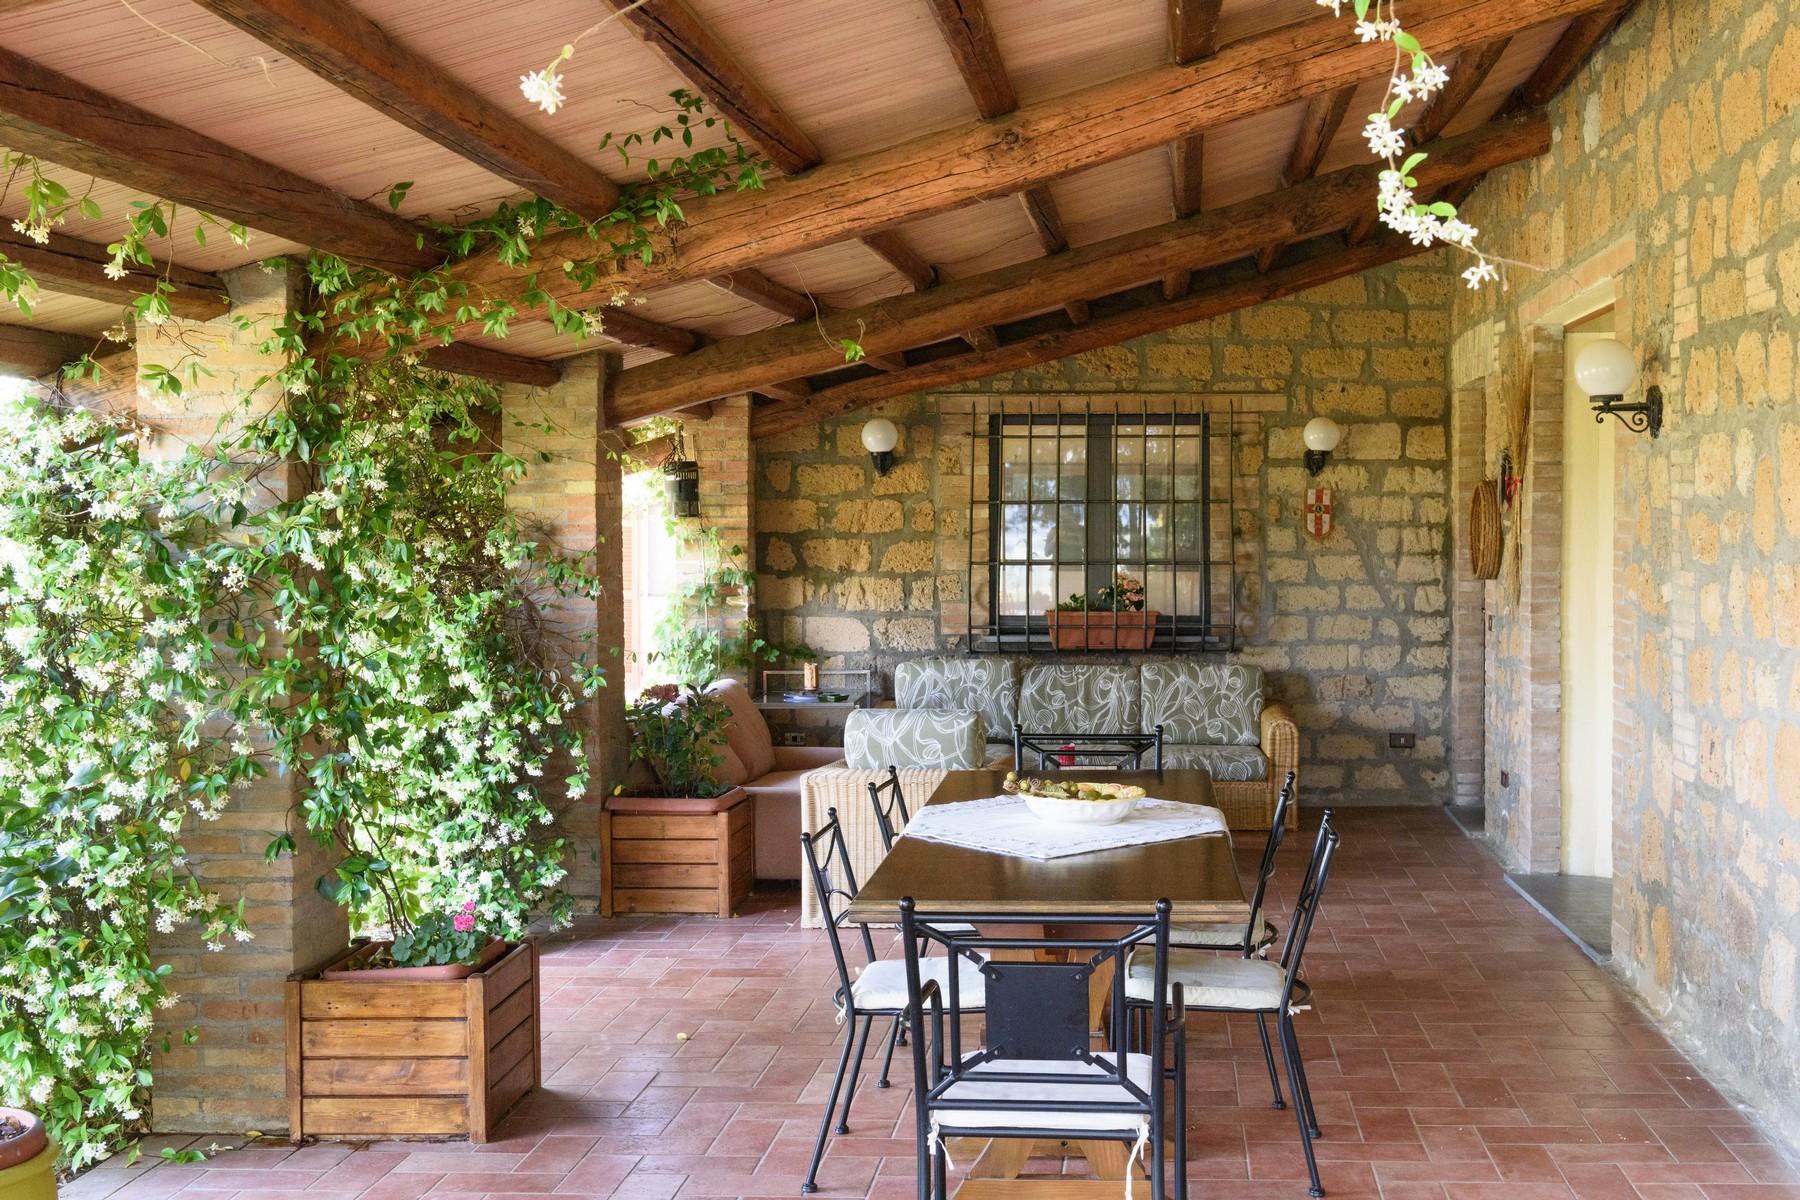 Casa indipendente in Vendita a Castel Viscardo: 5 locali, 700 mq - Foto 6